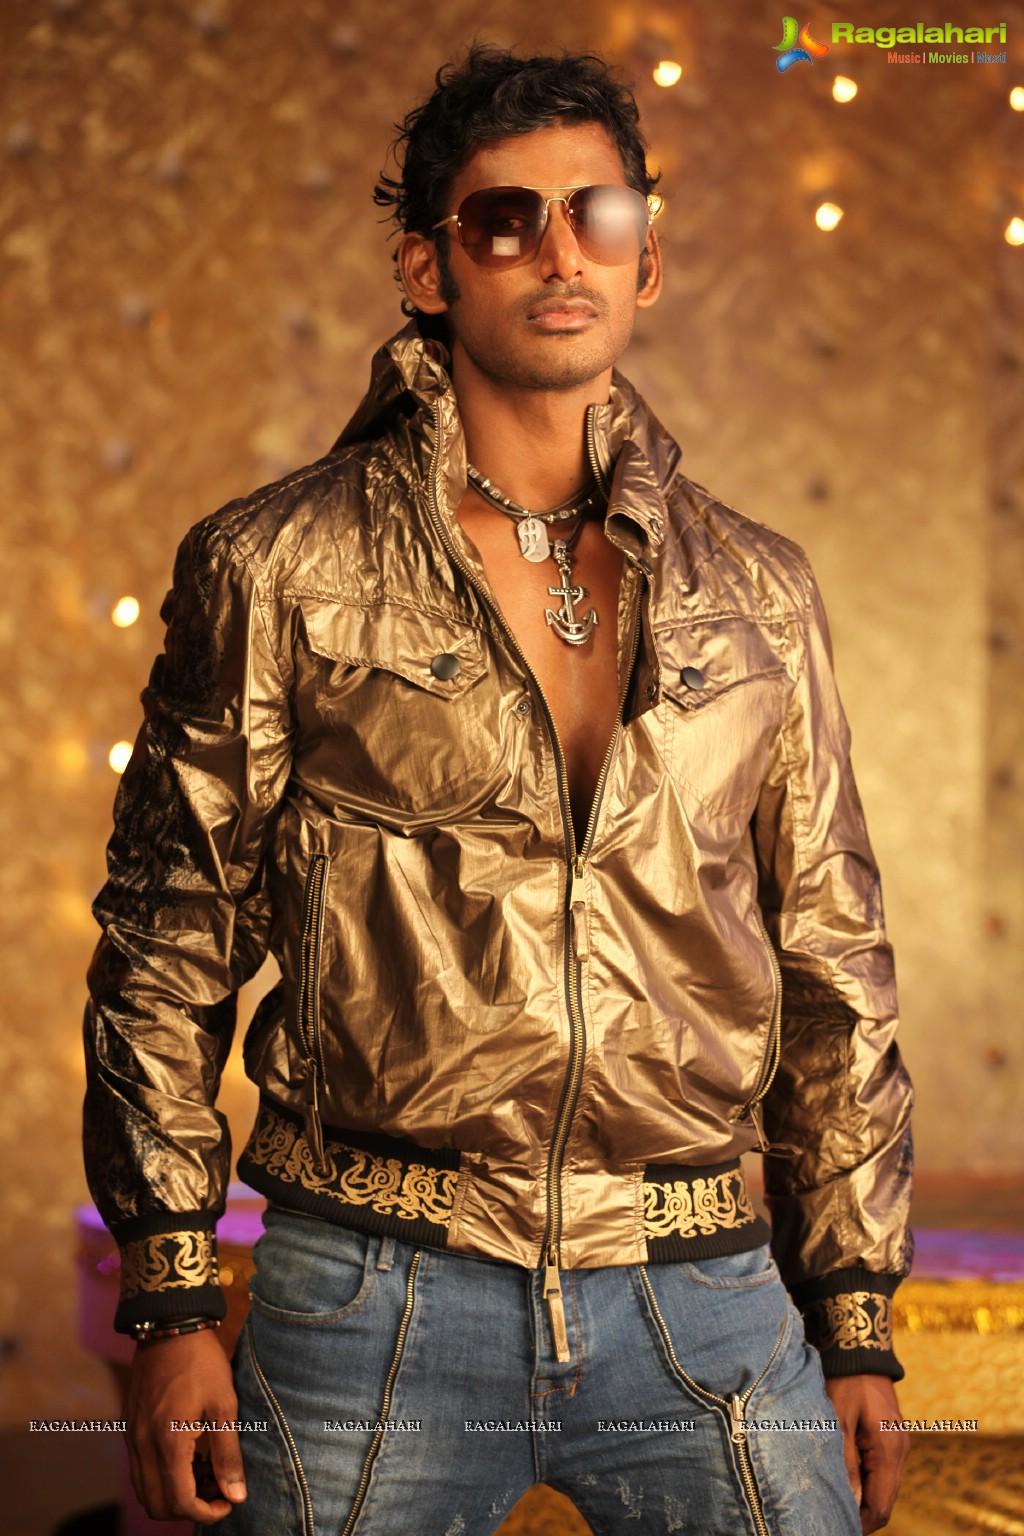 Vishal Krishna Image 6 Latest Actor Galleriesimages Photos